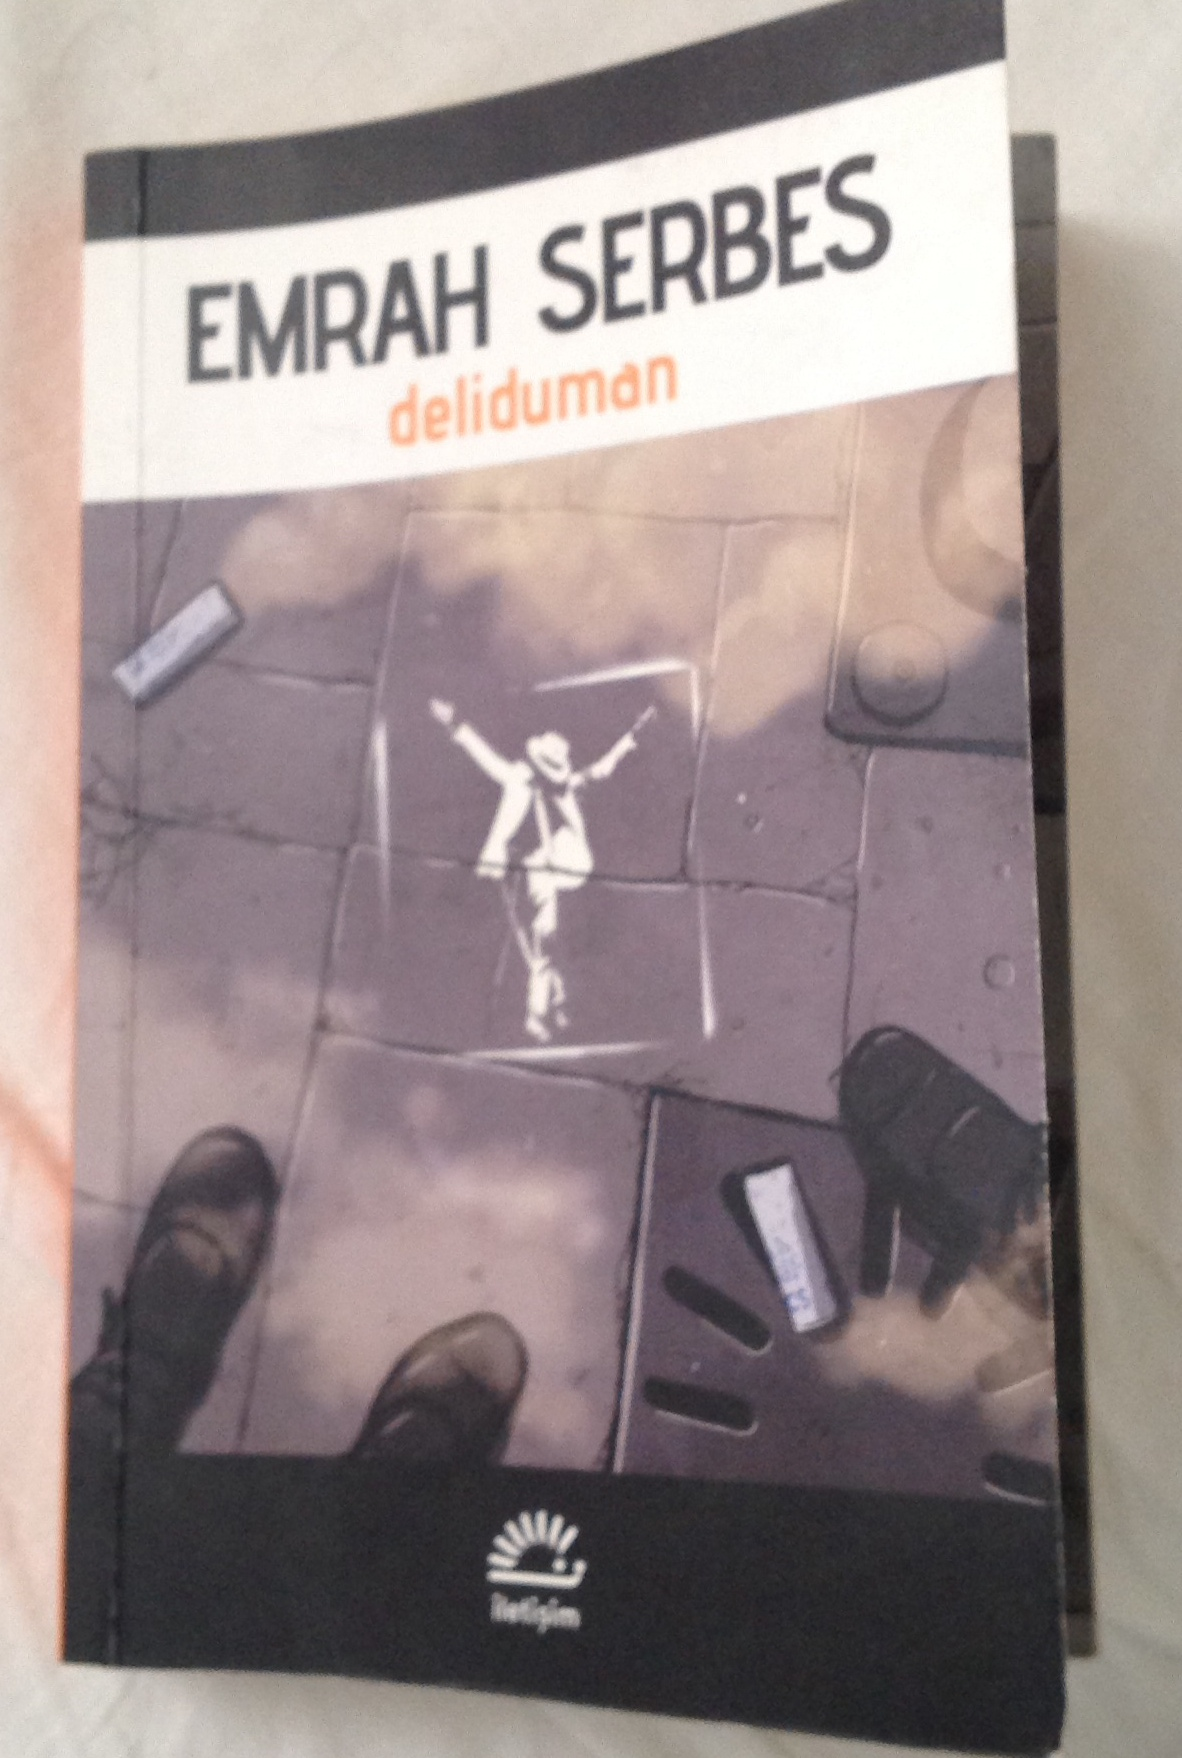 EMRAH SERBES DELIDUMAN PDF DOWNLOAD